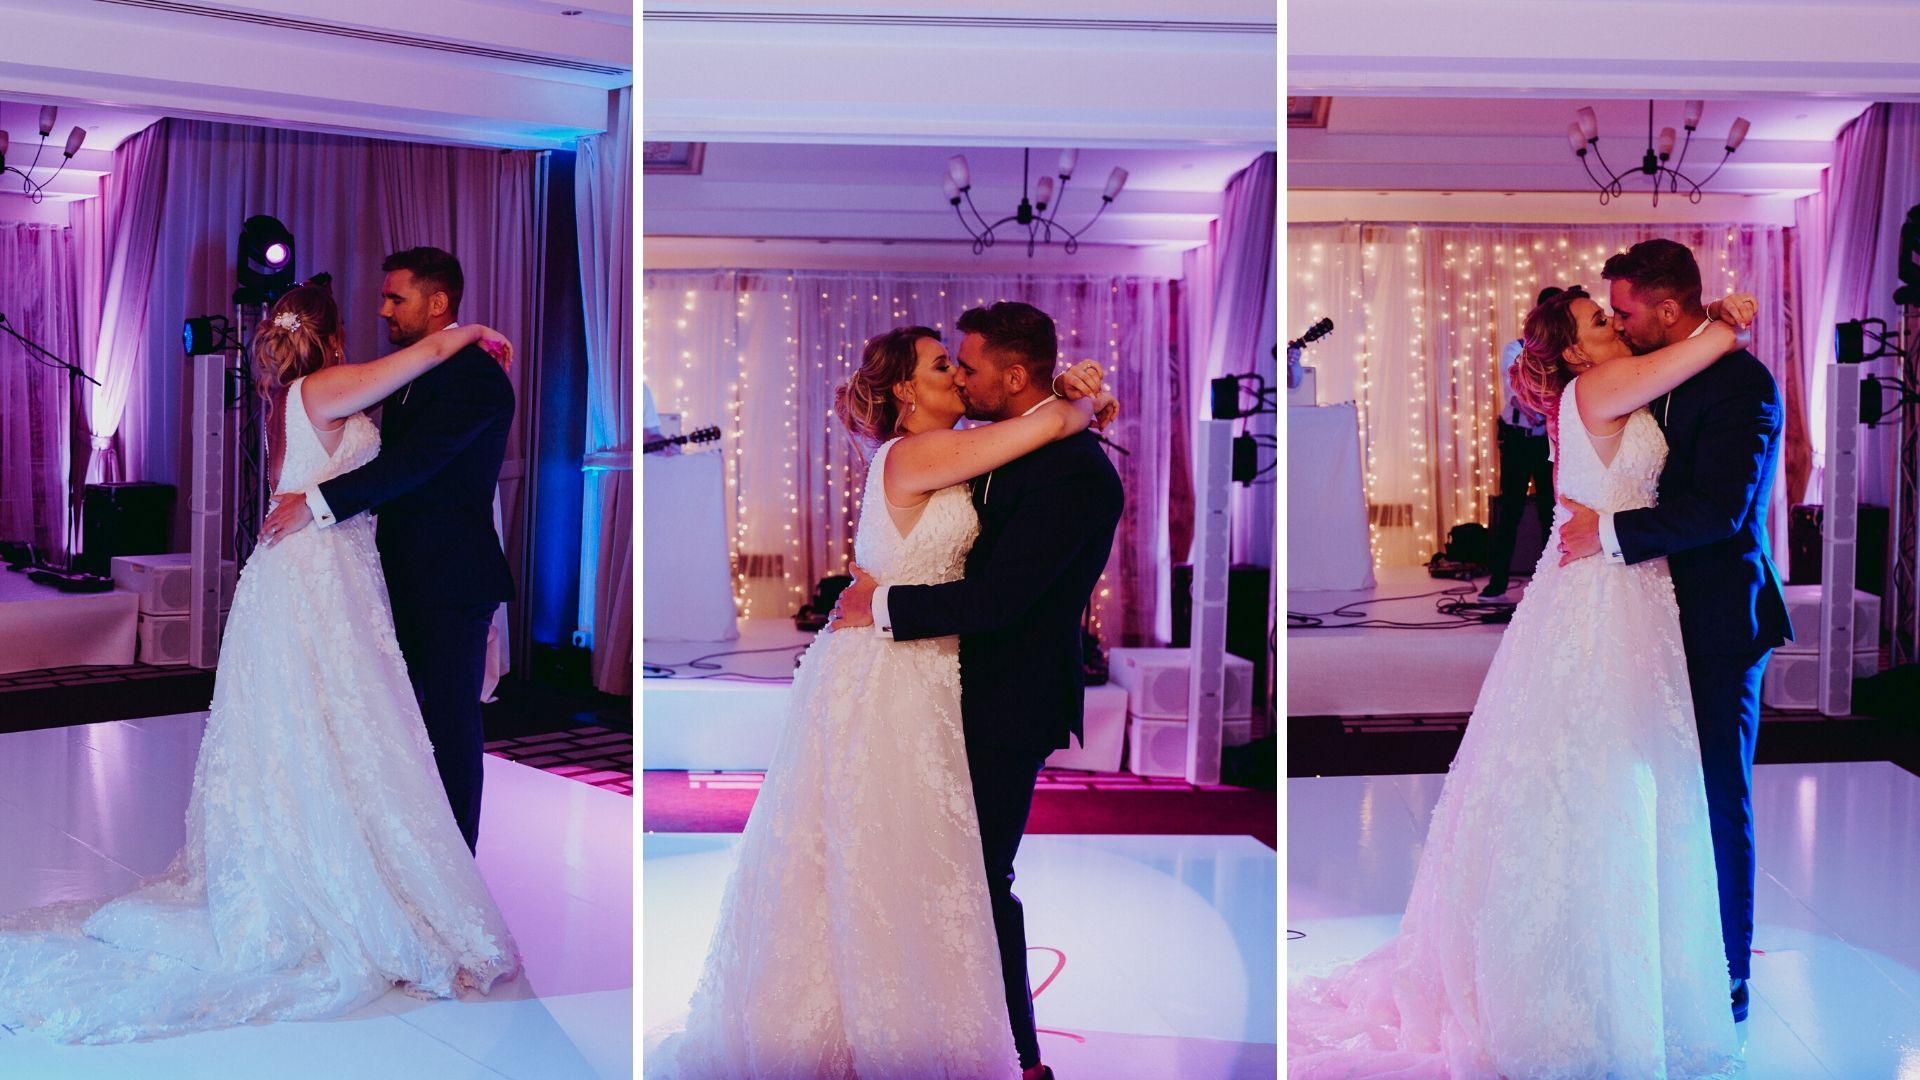 Abbi and Ryan's First Dance